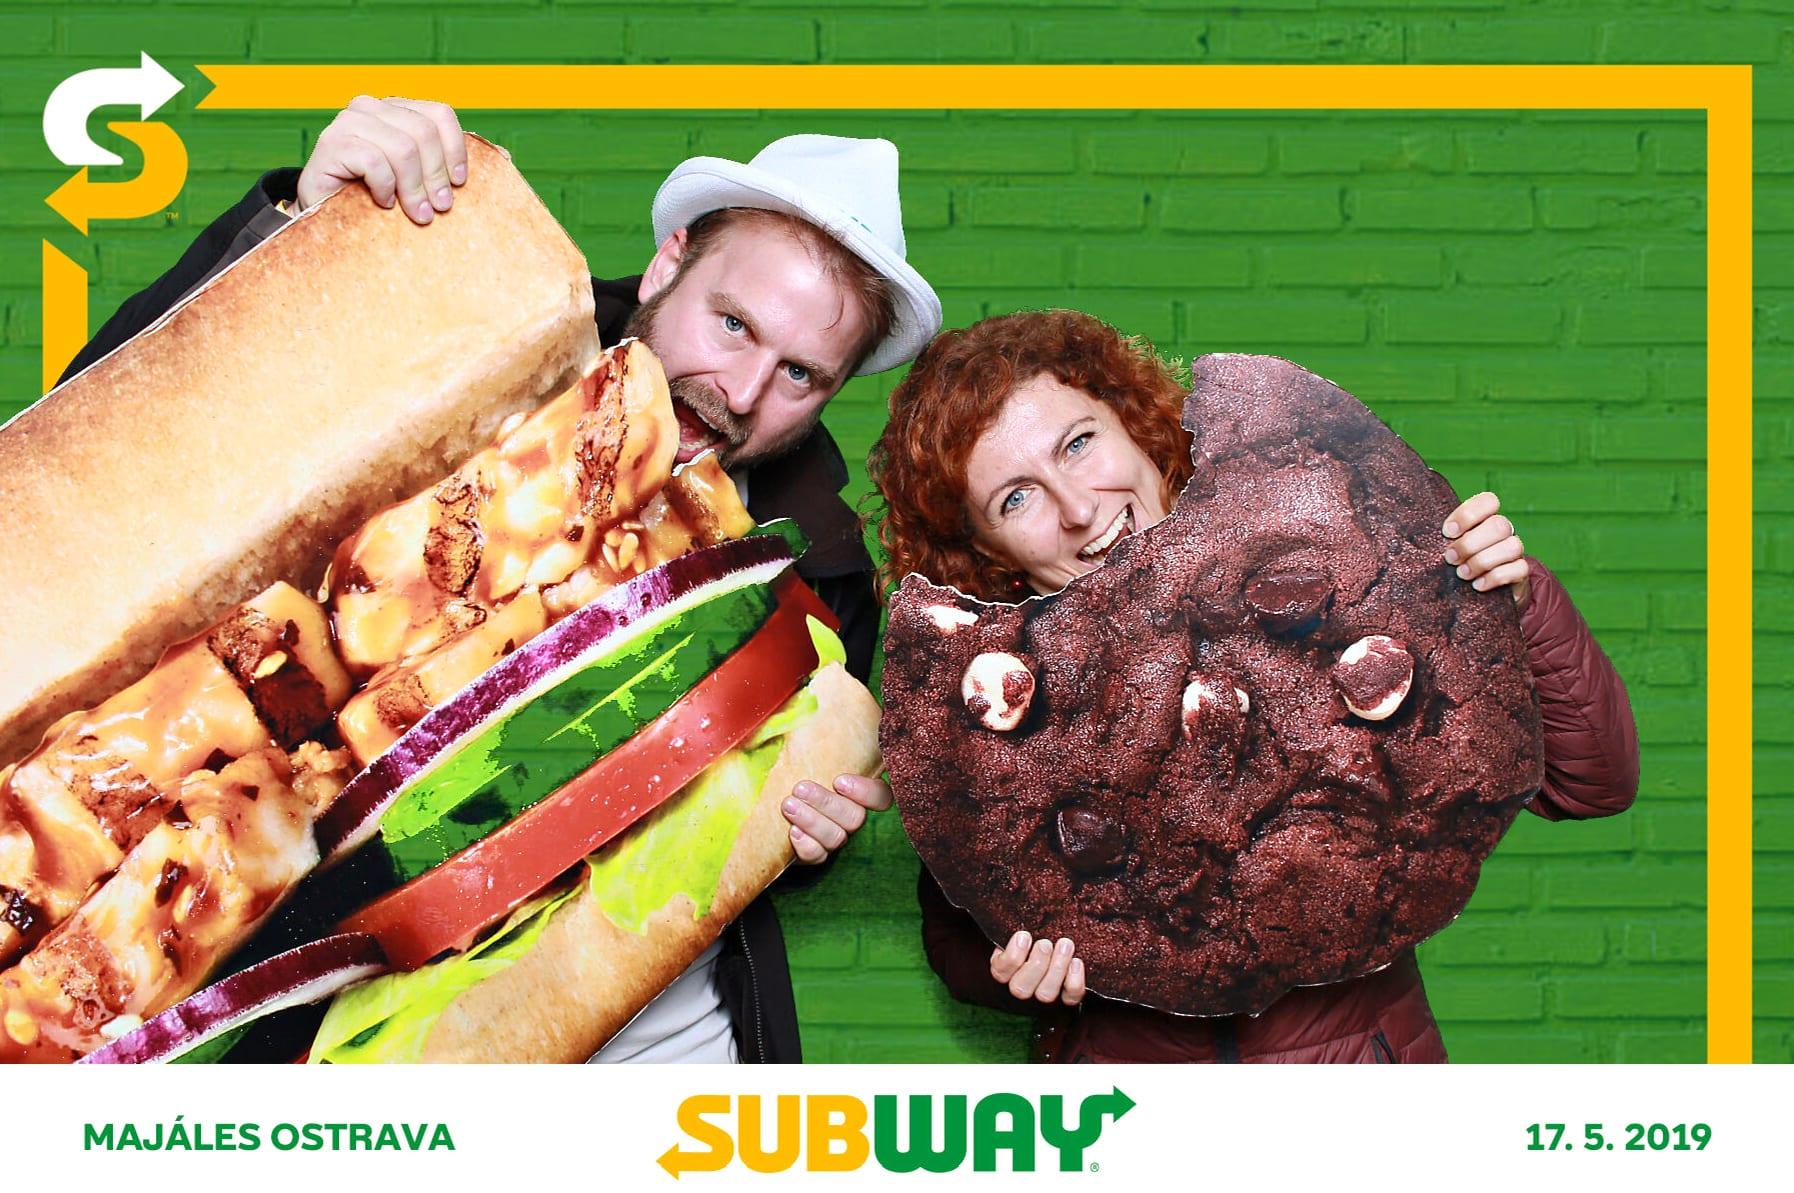 fotokoutek-subway-majales-16-5-2019-607451